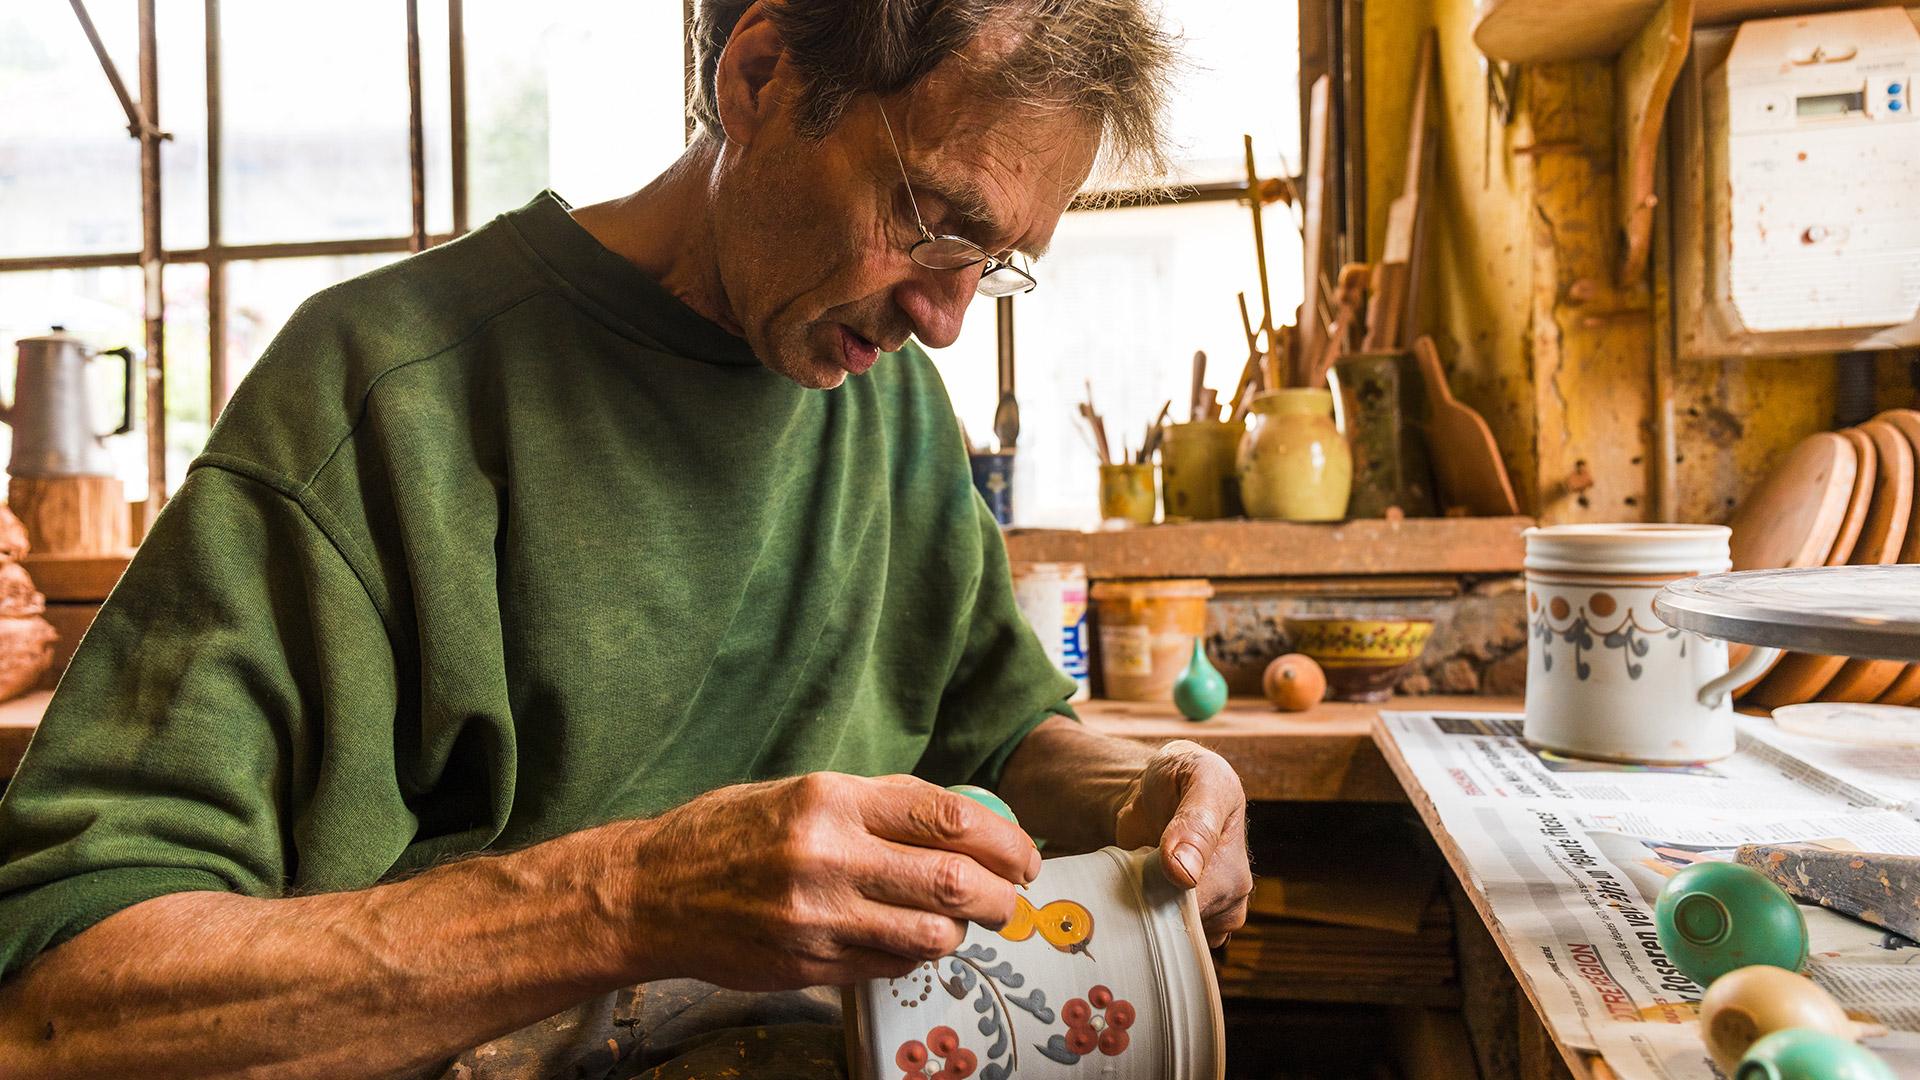 2017-poterie-c-cattin-alpcat-medias-le-grand-bornand-tourisme-8m9a0187-147896